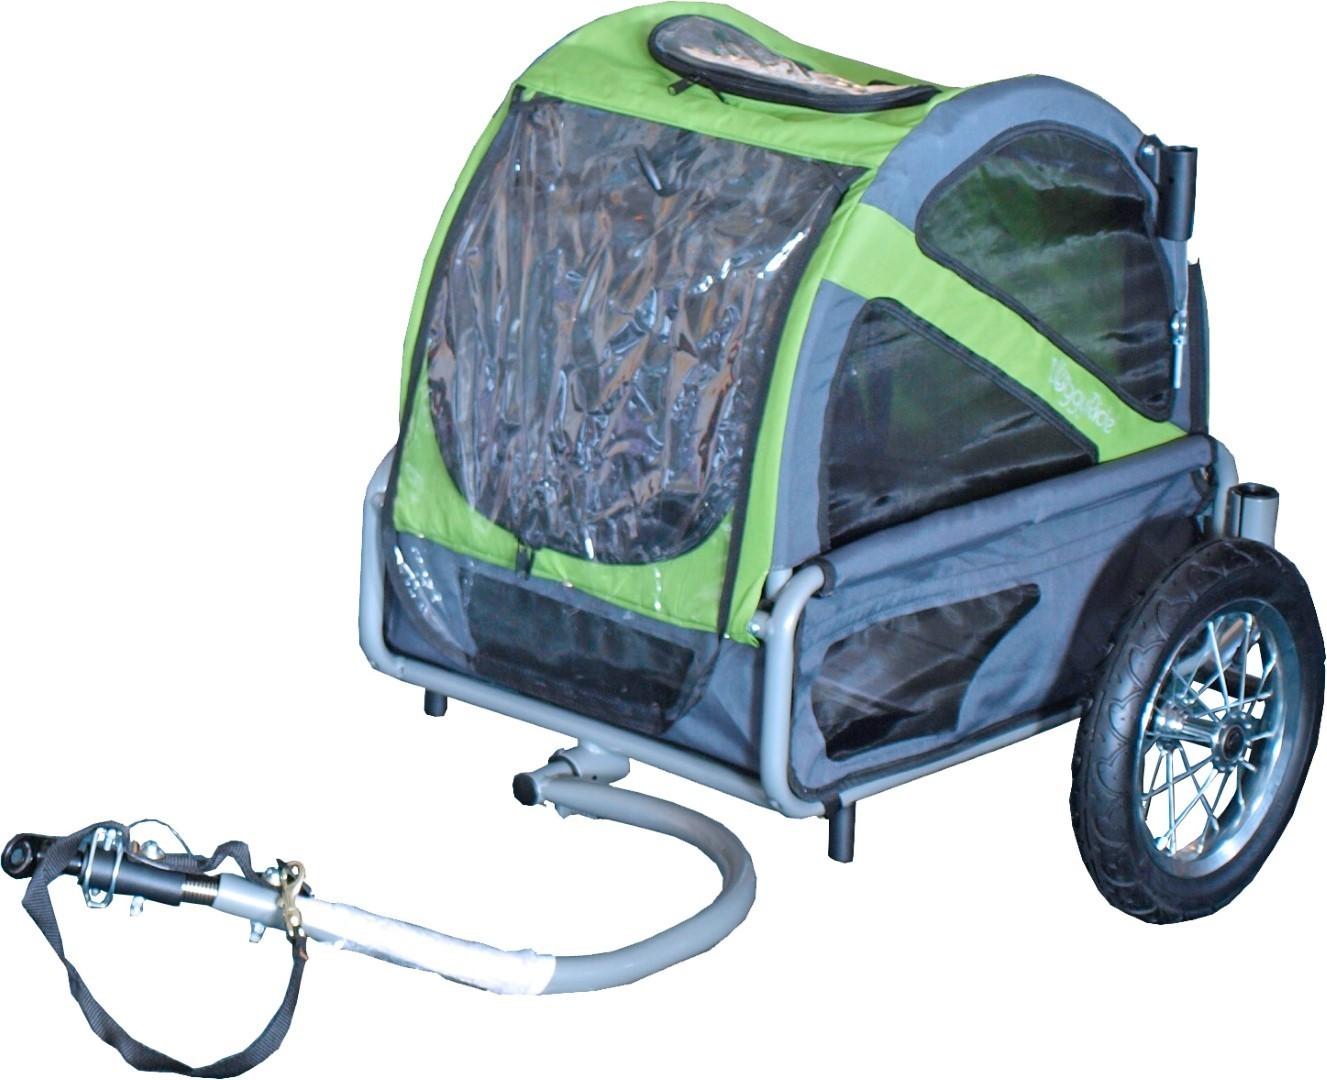 Doggy Ride fietskar Mini groen/grijs